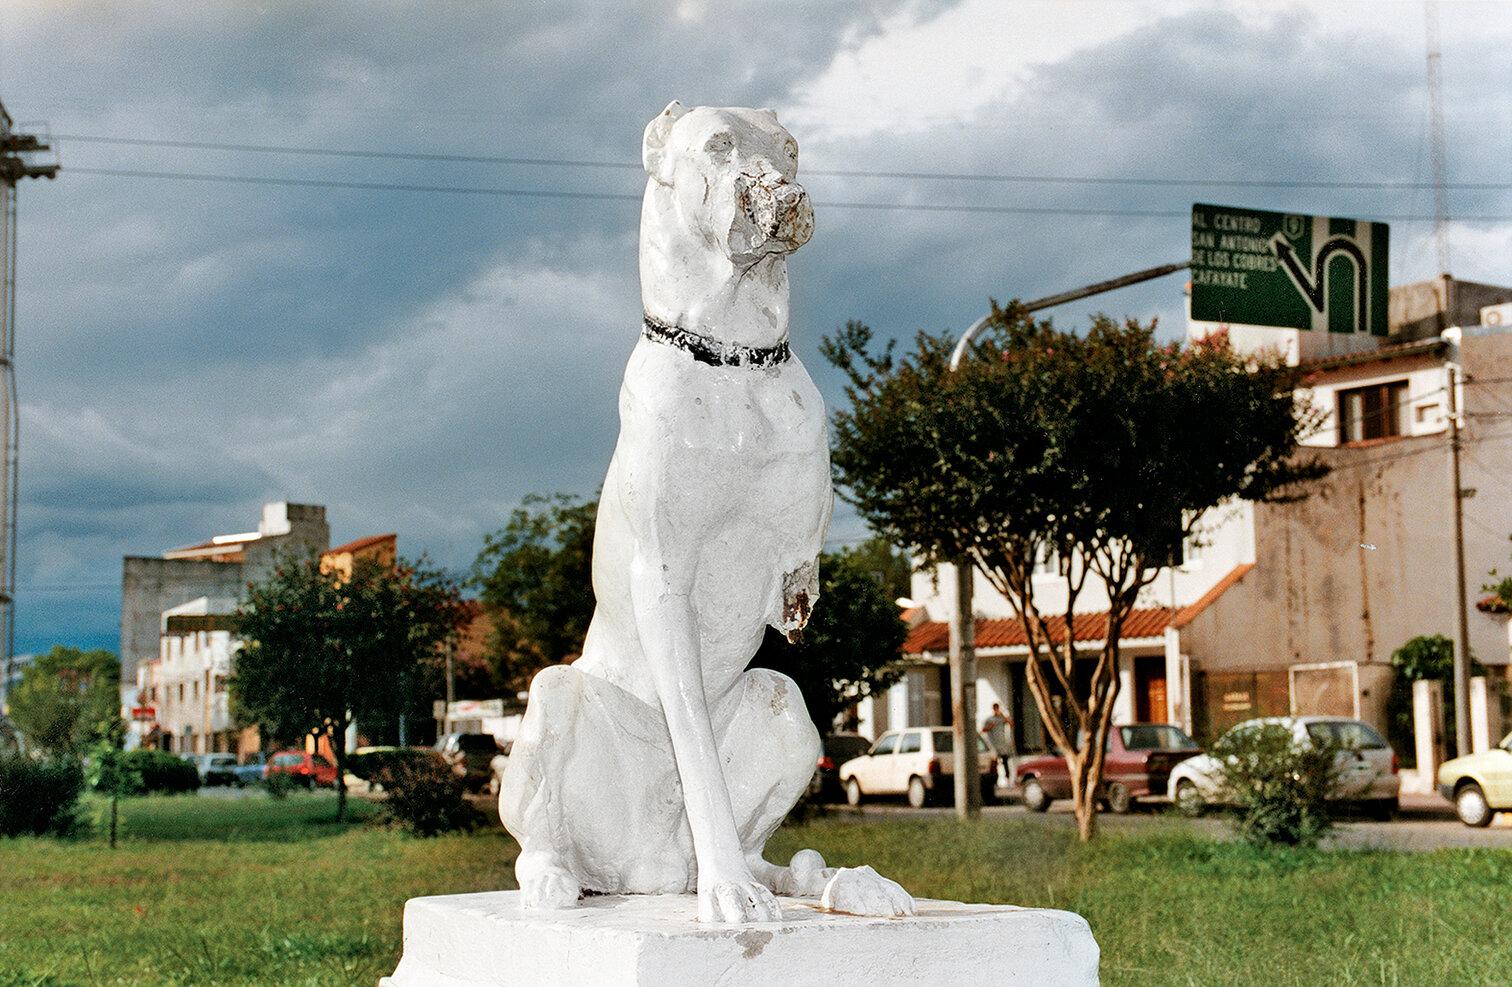 11 Perro manco-Dog without leg 2001 copia.jpg